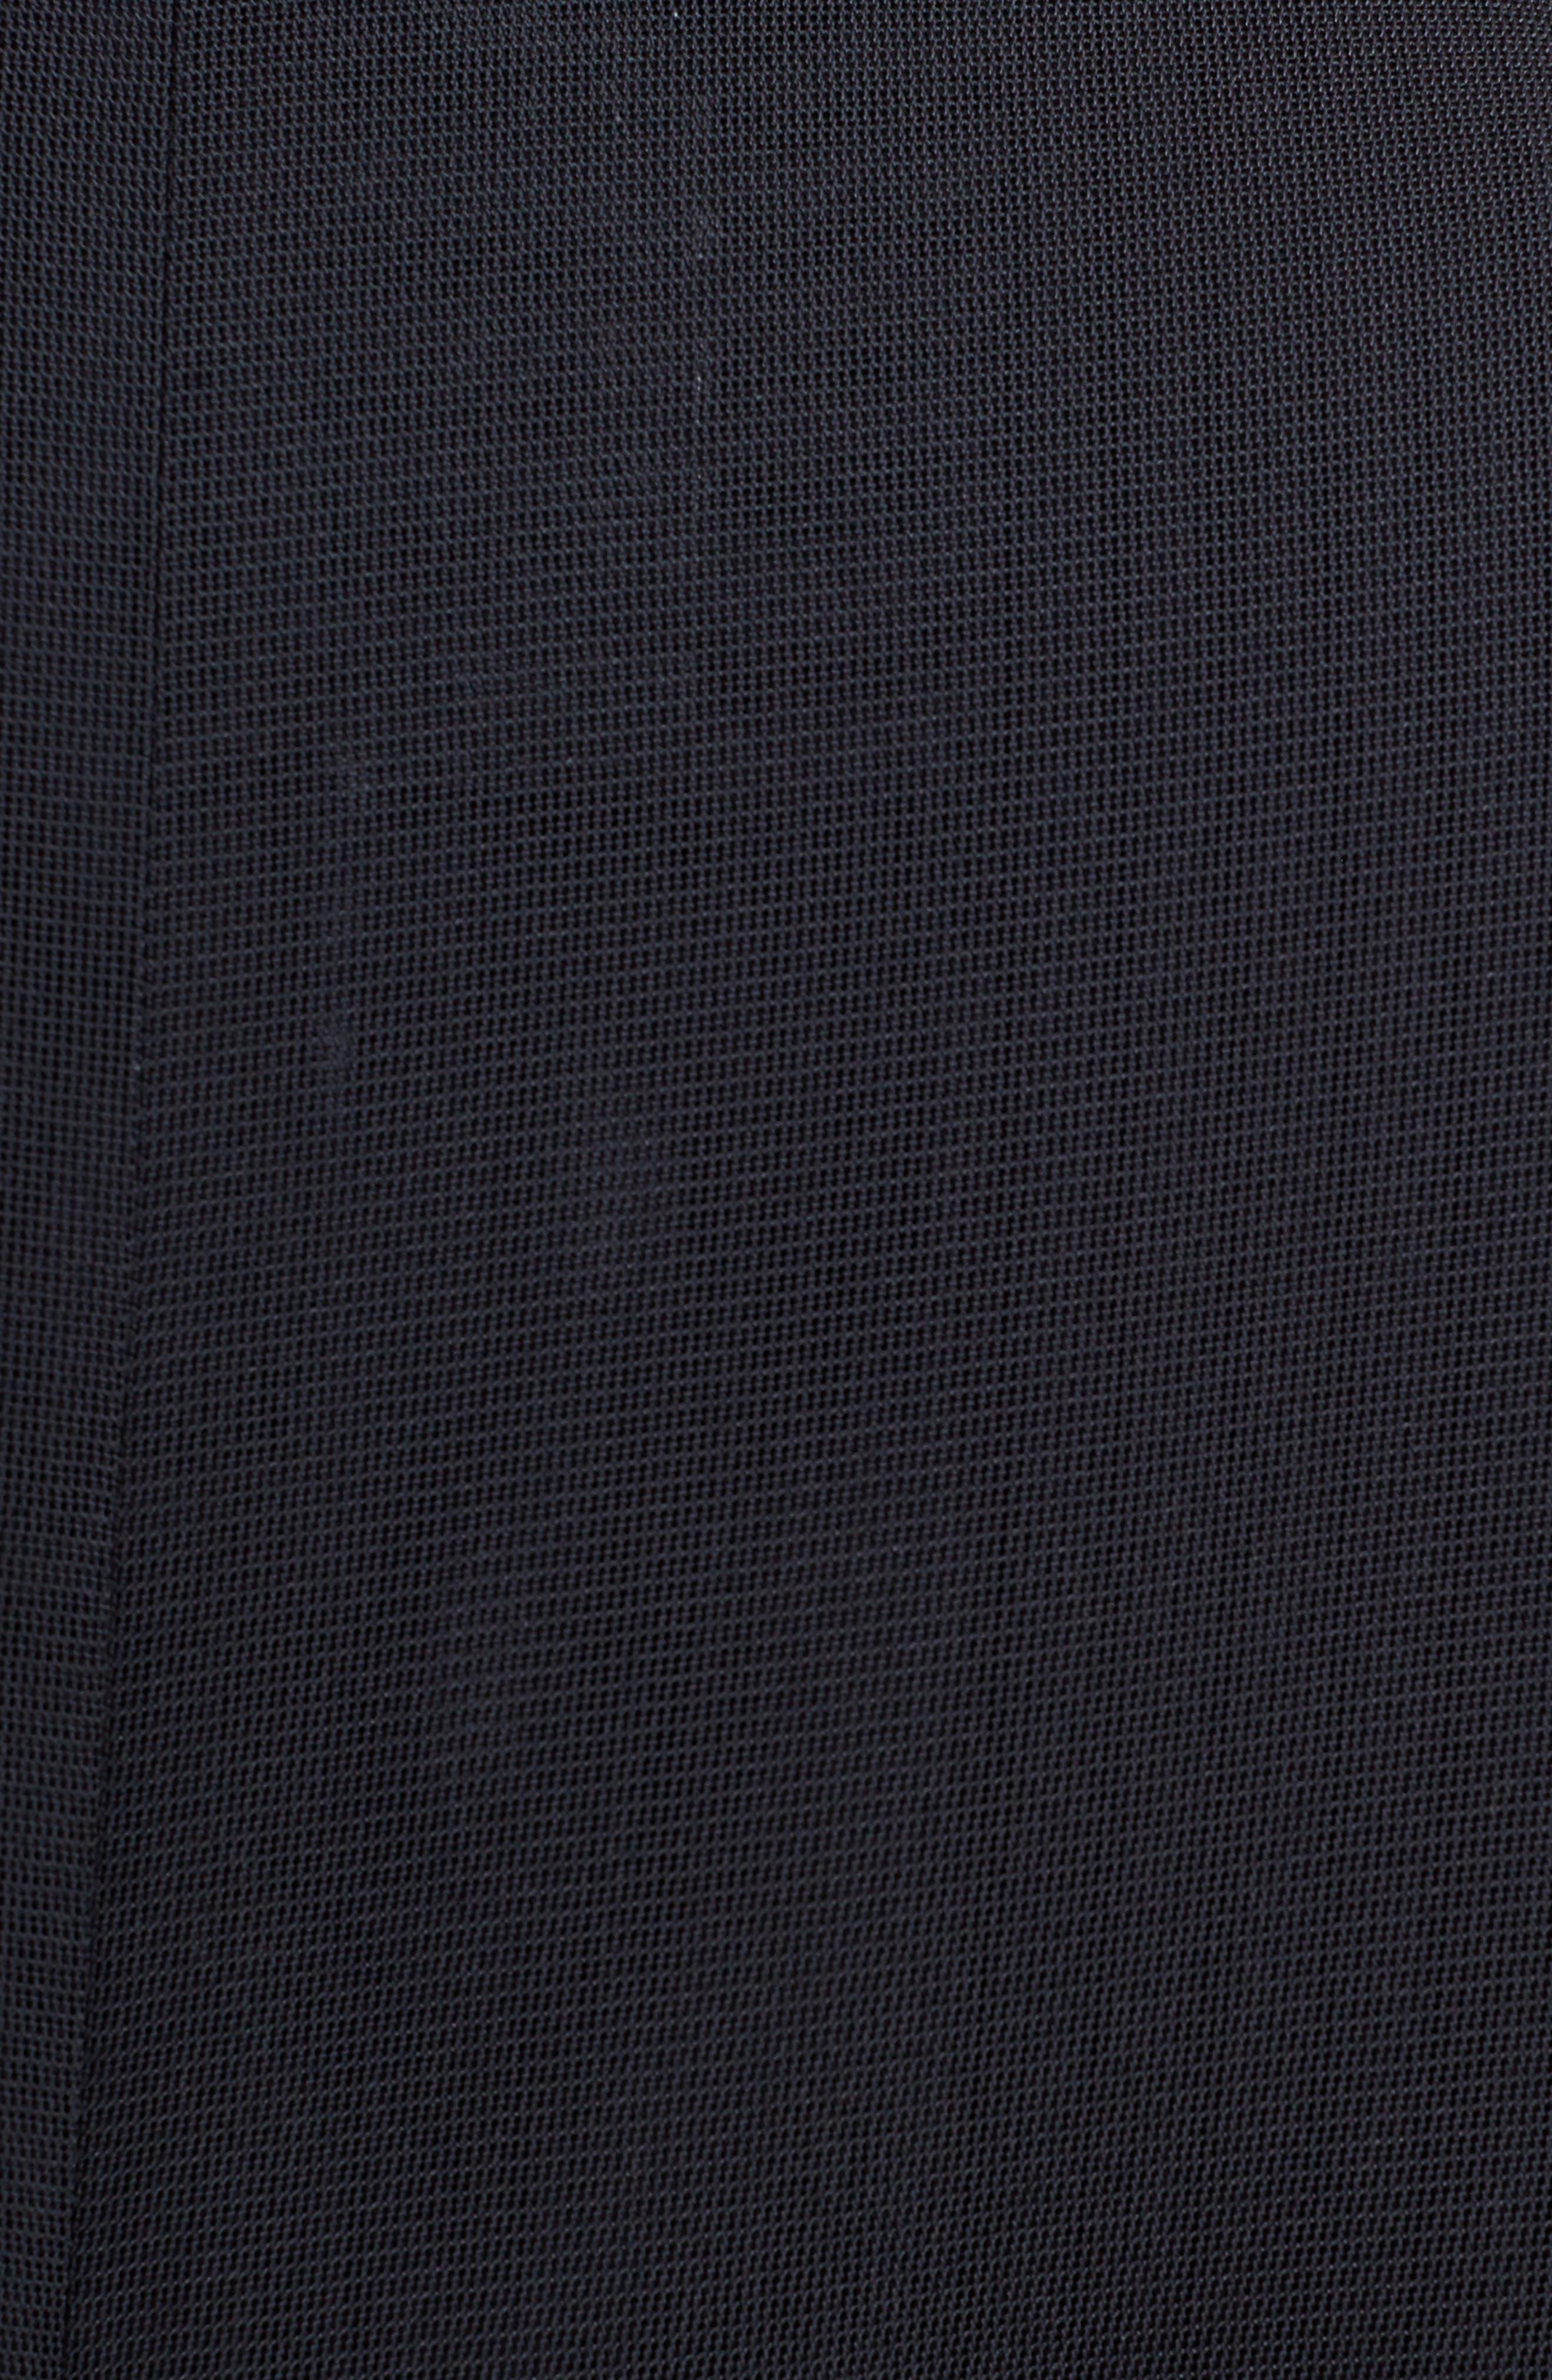 Mesh Bomber Jacket,                             Alternate thumbnail 5, color,                             001